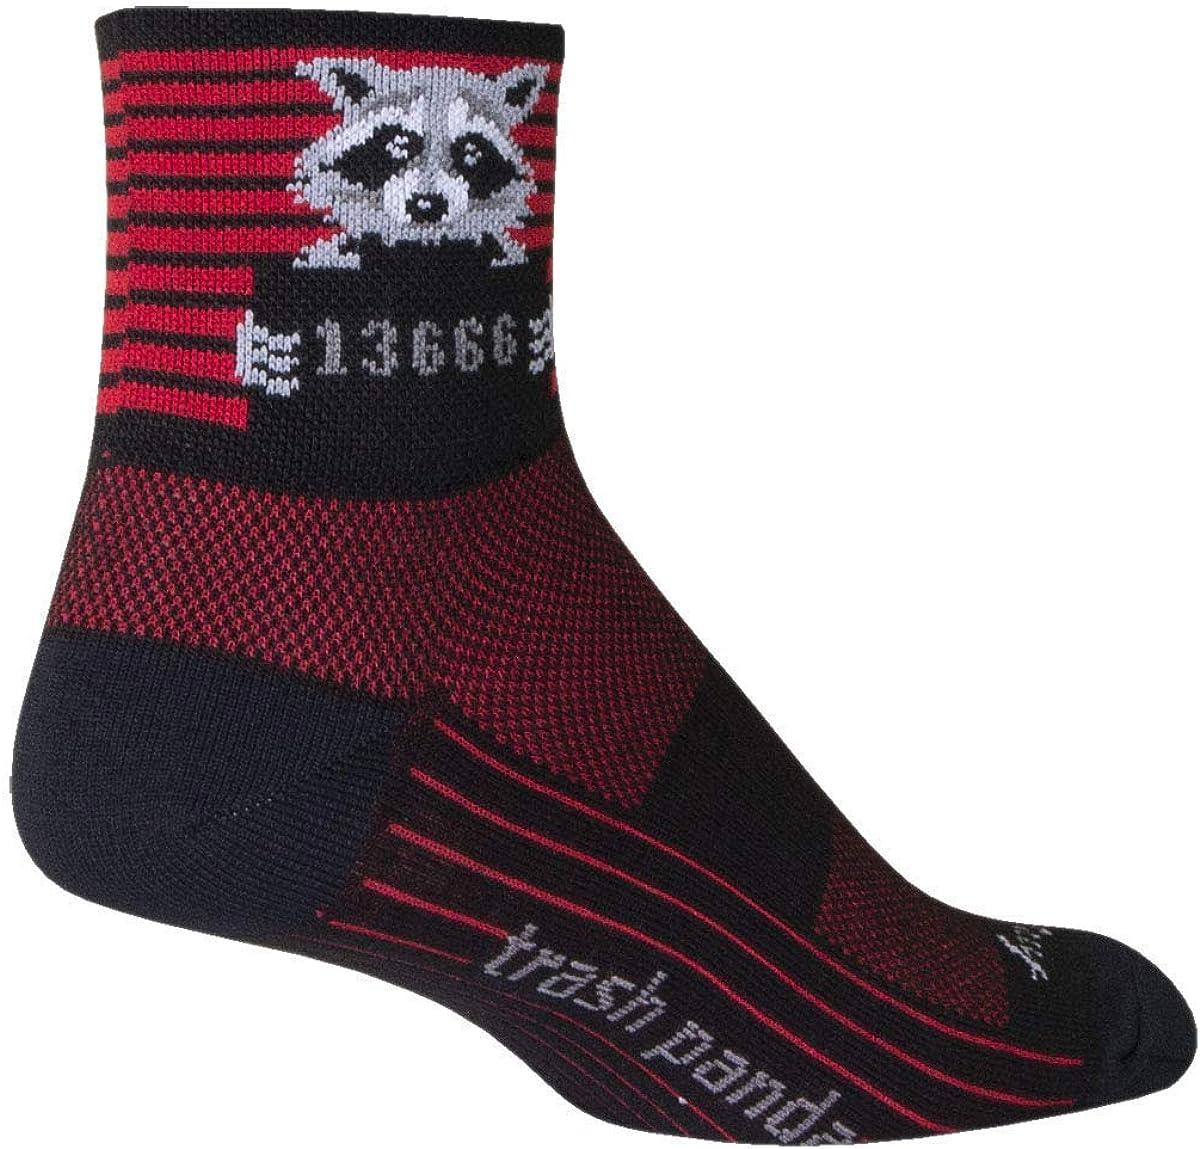 SockGuy Unisex Busted Classic Socks, 3-inch